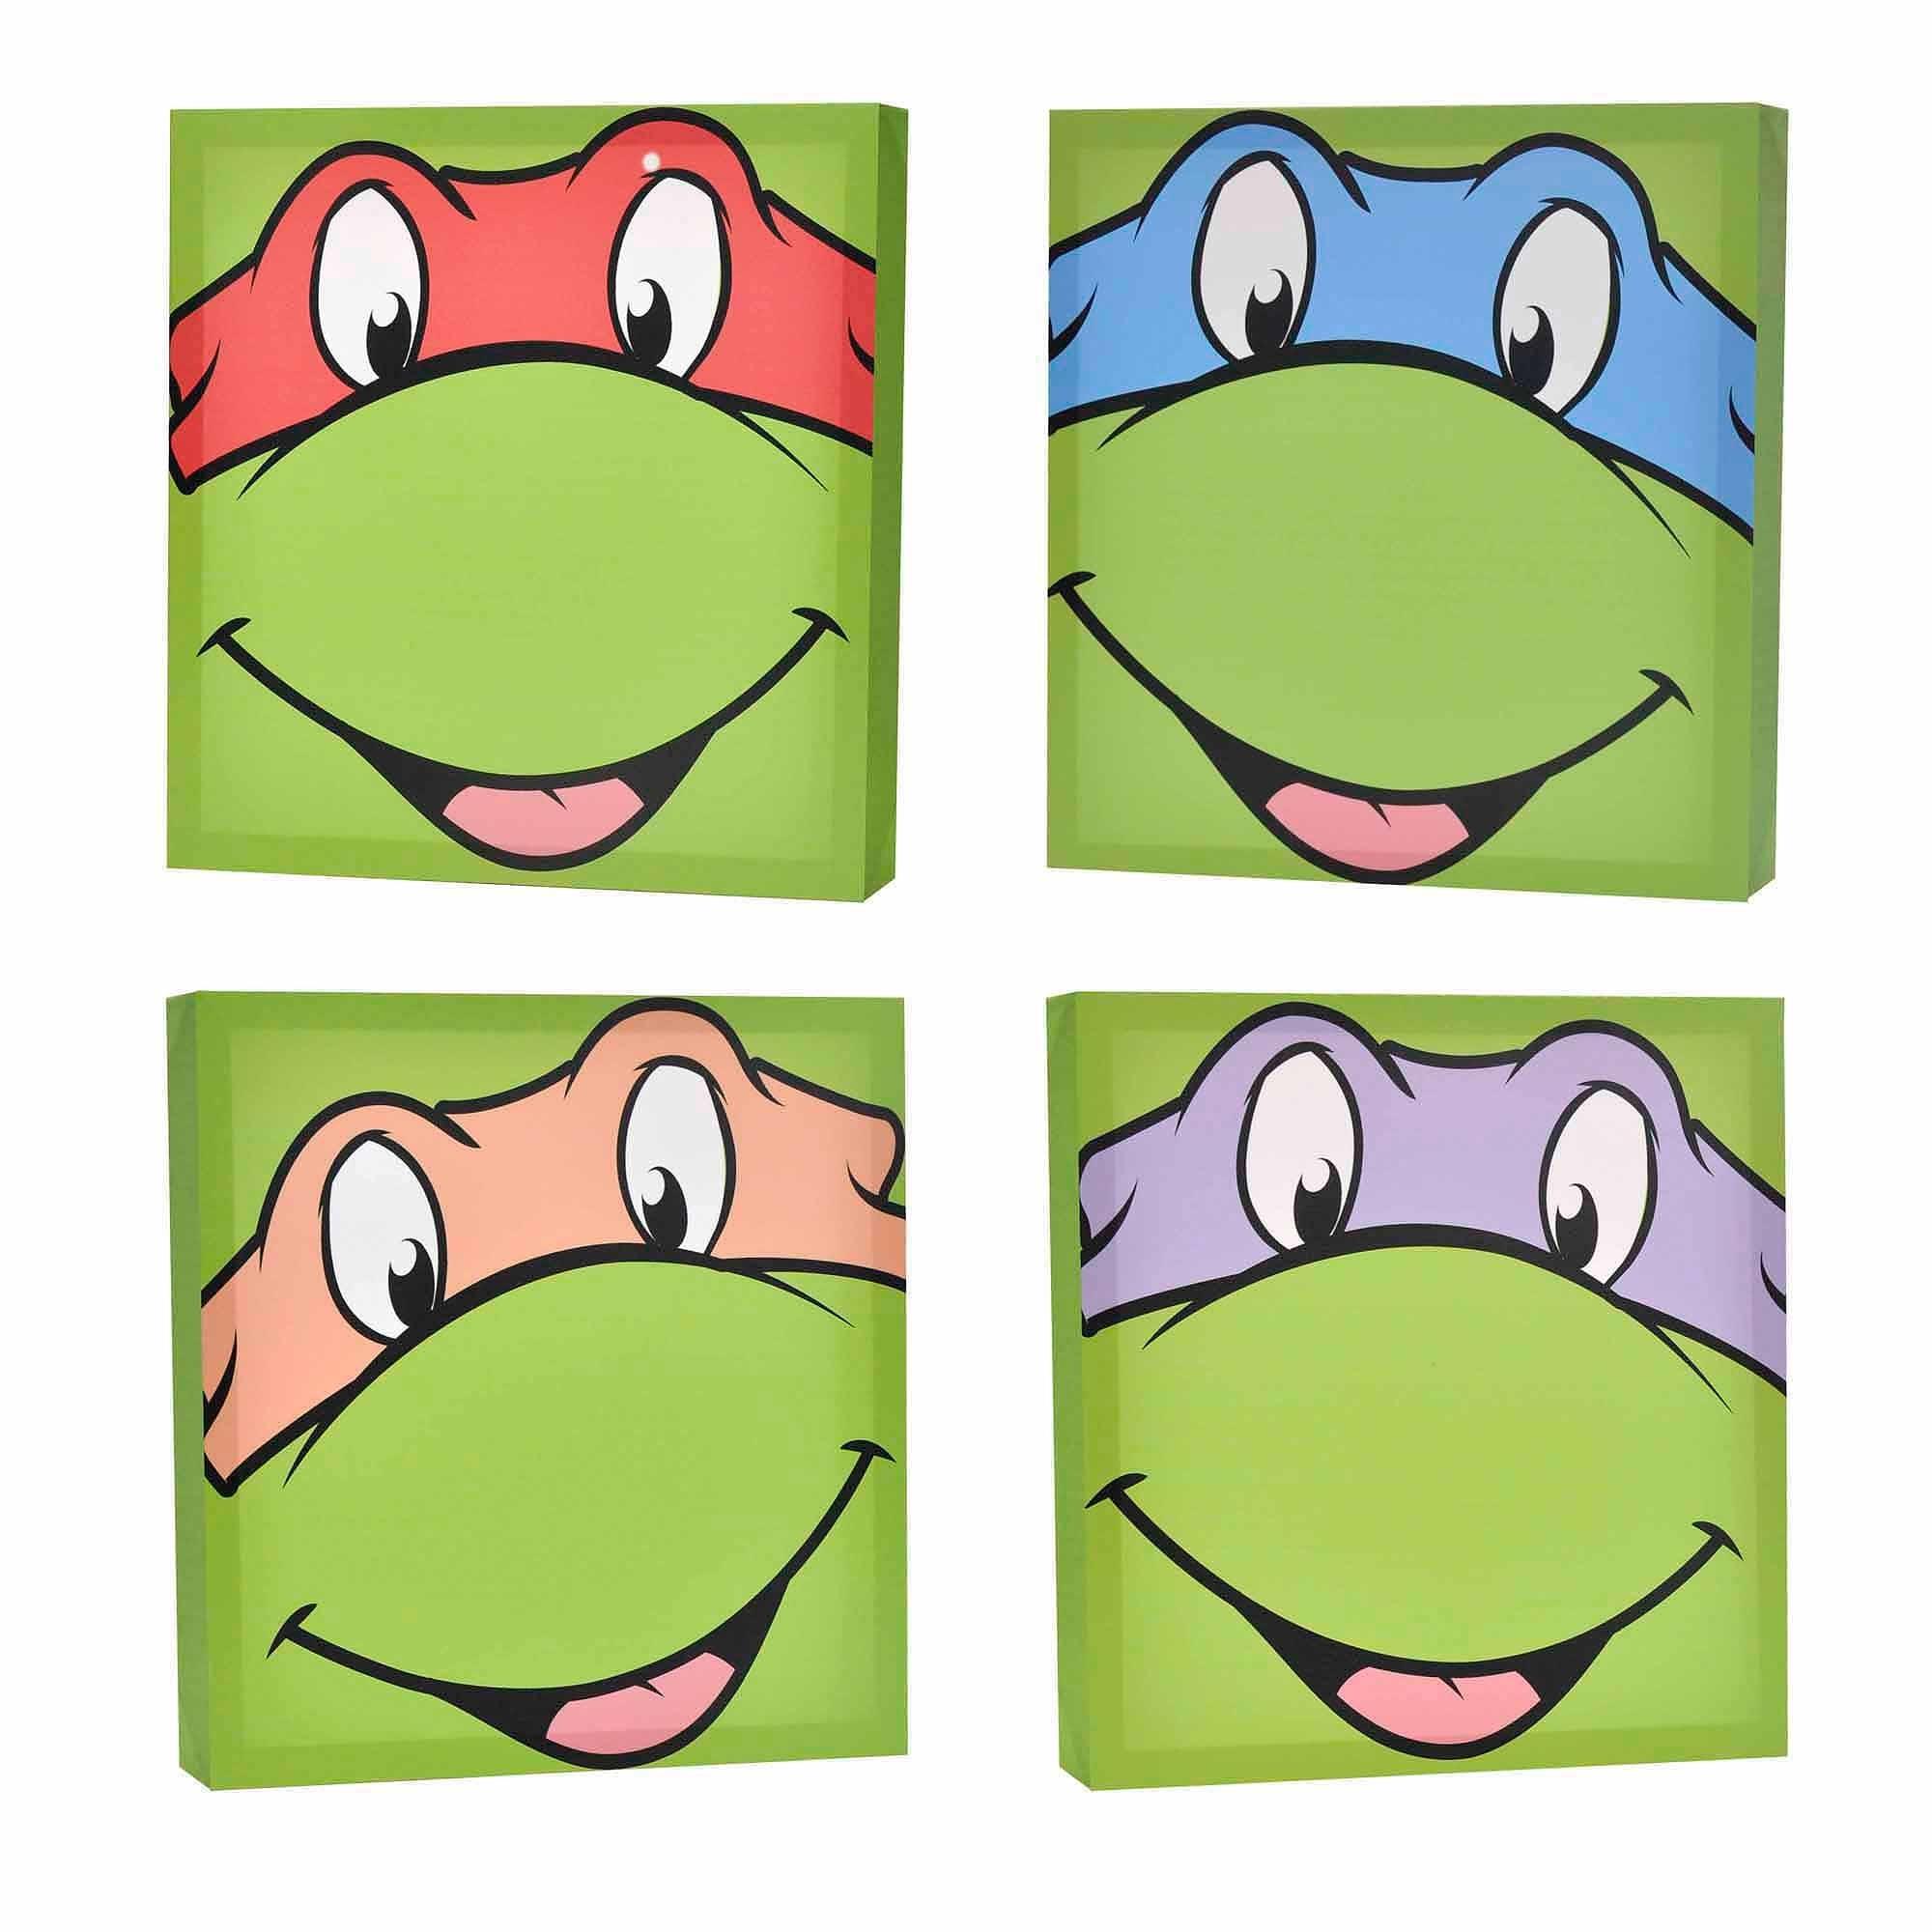 Nickelodeon Teenage Mutant Ninja Turtles 4 Pack Canvas Wall Art Regarding Most Popular Ninja Turtle Wall Art (Gallery 7 of 20)